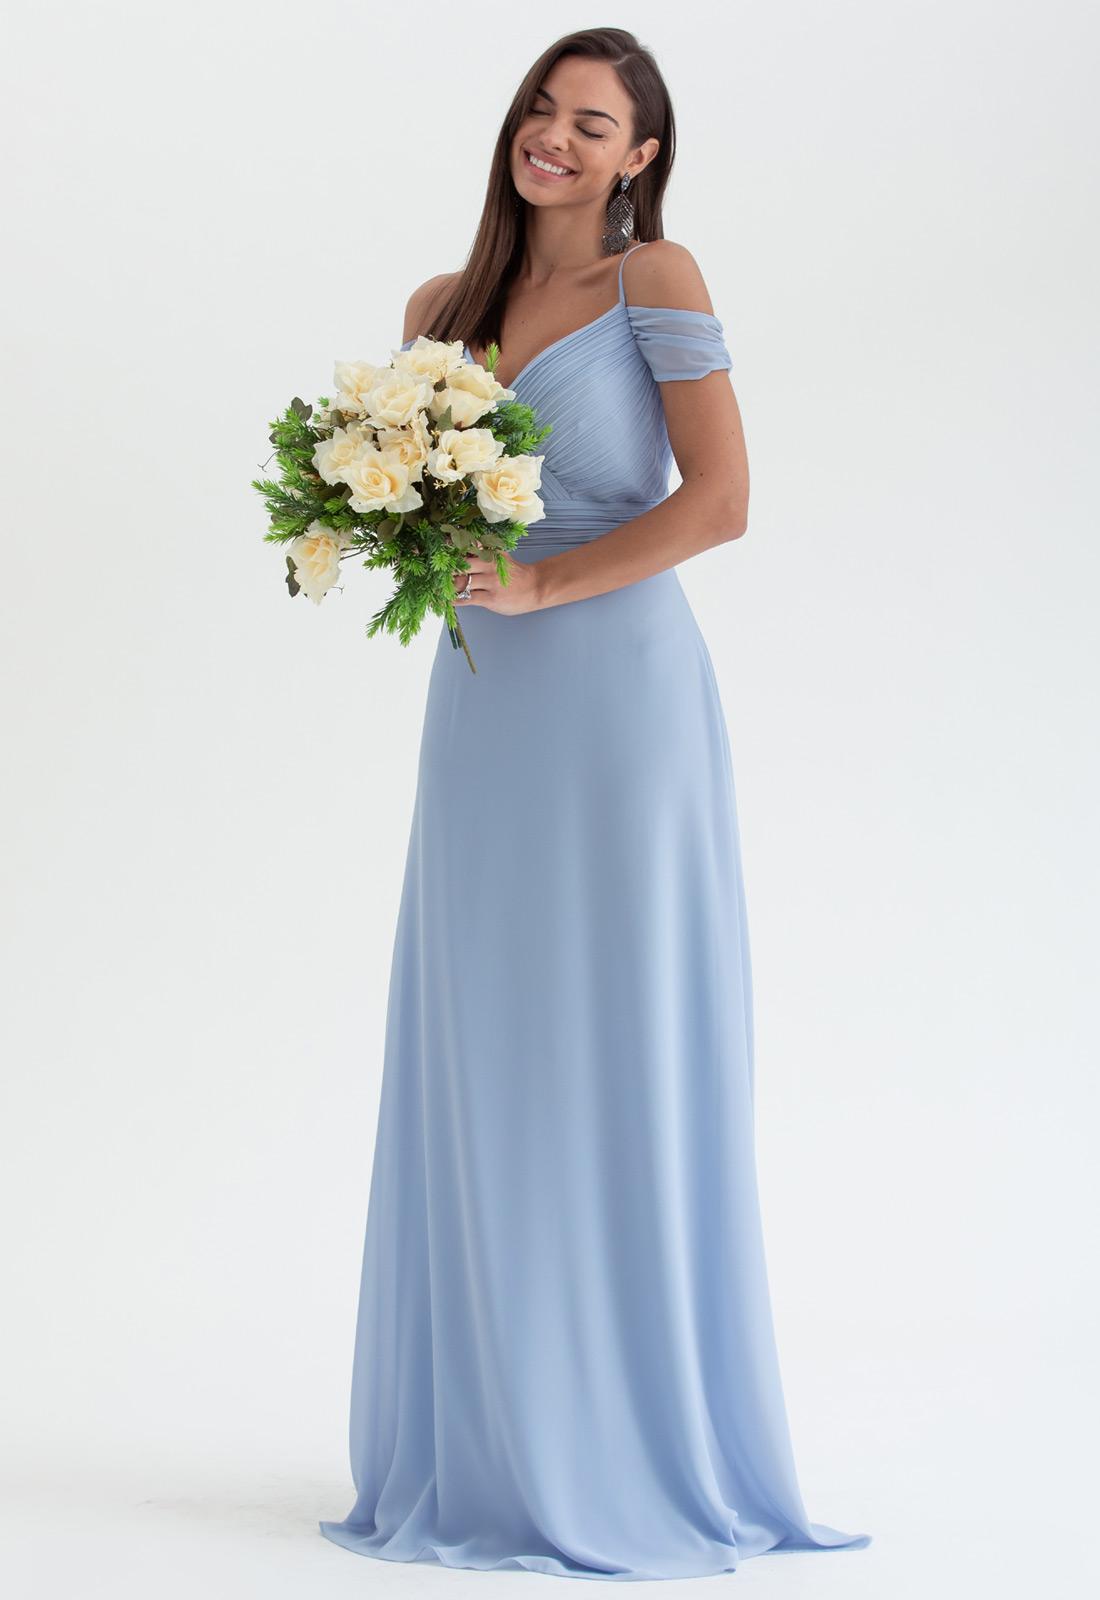 Vestido azul serenity longo madrinha ref. 2474